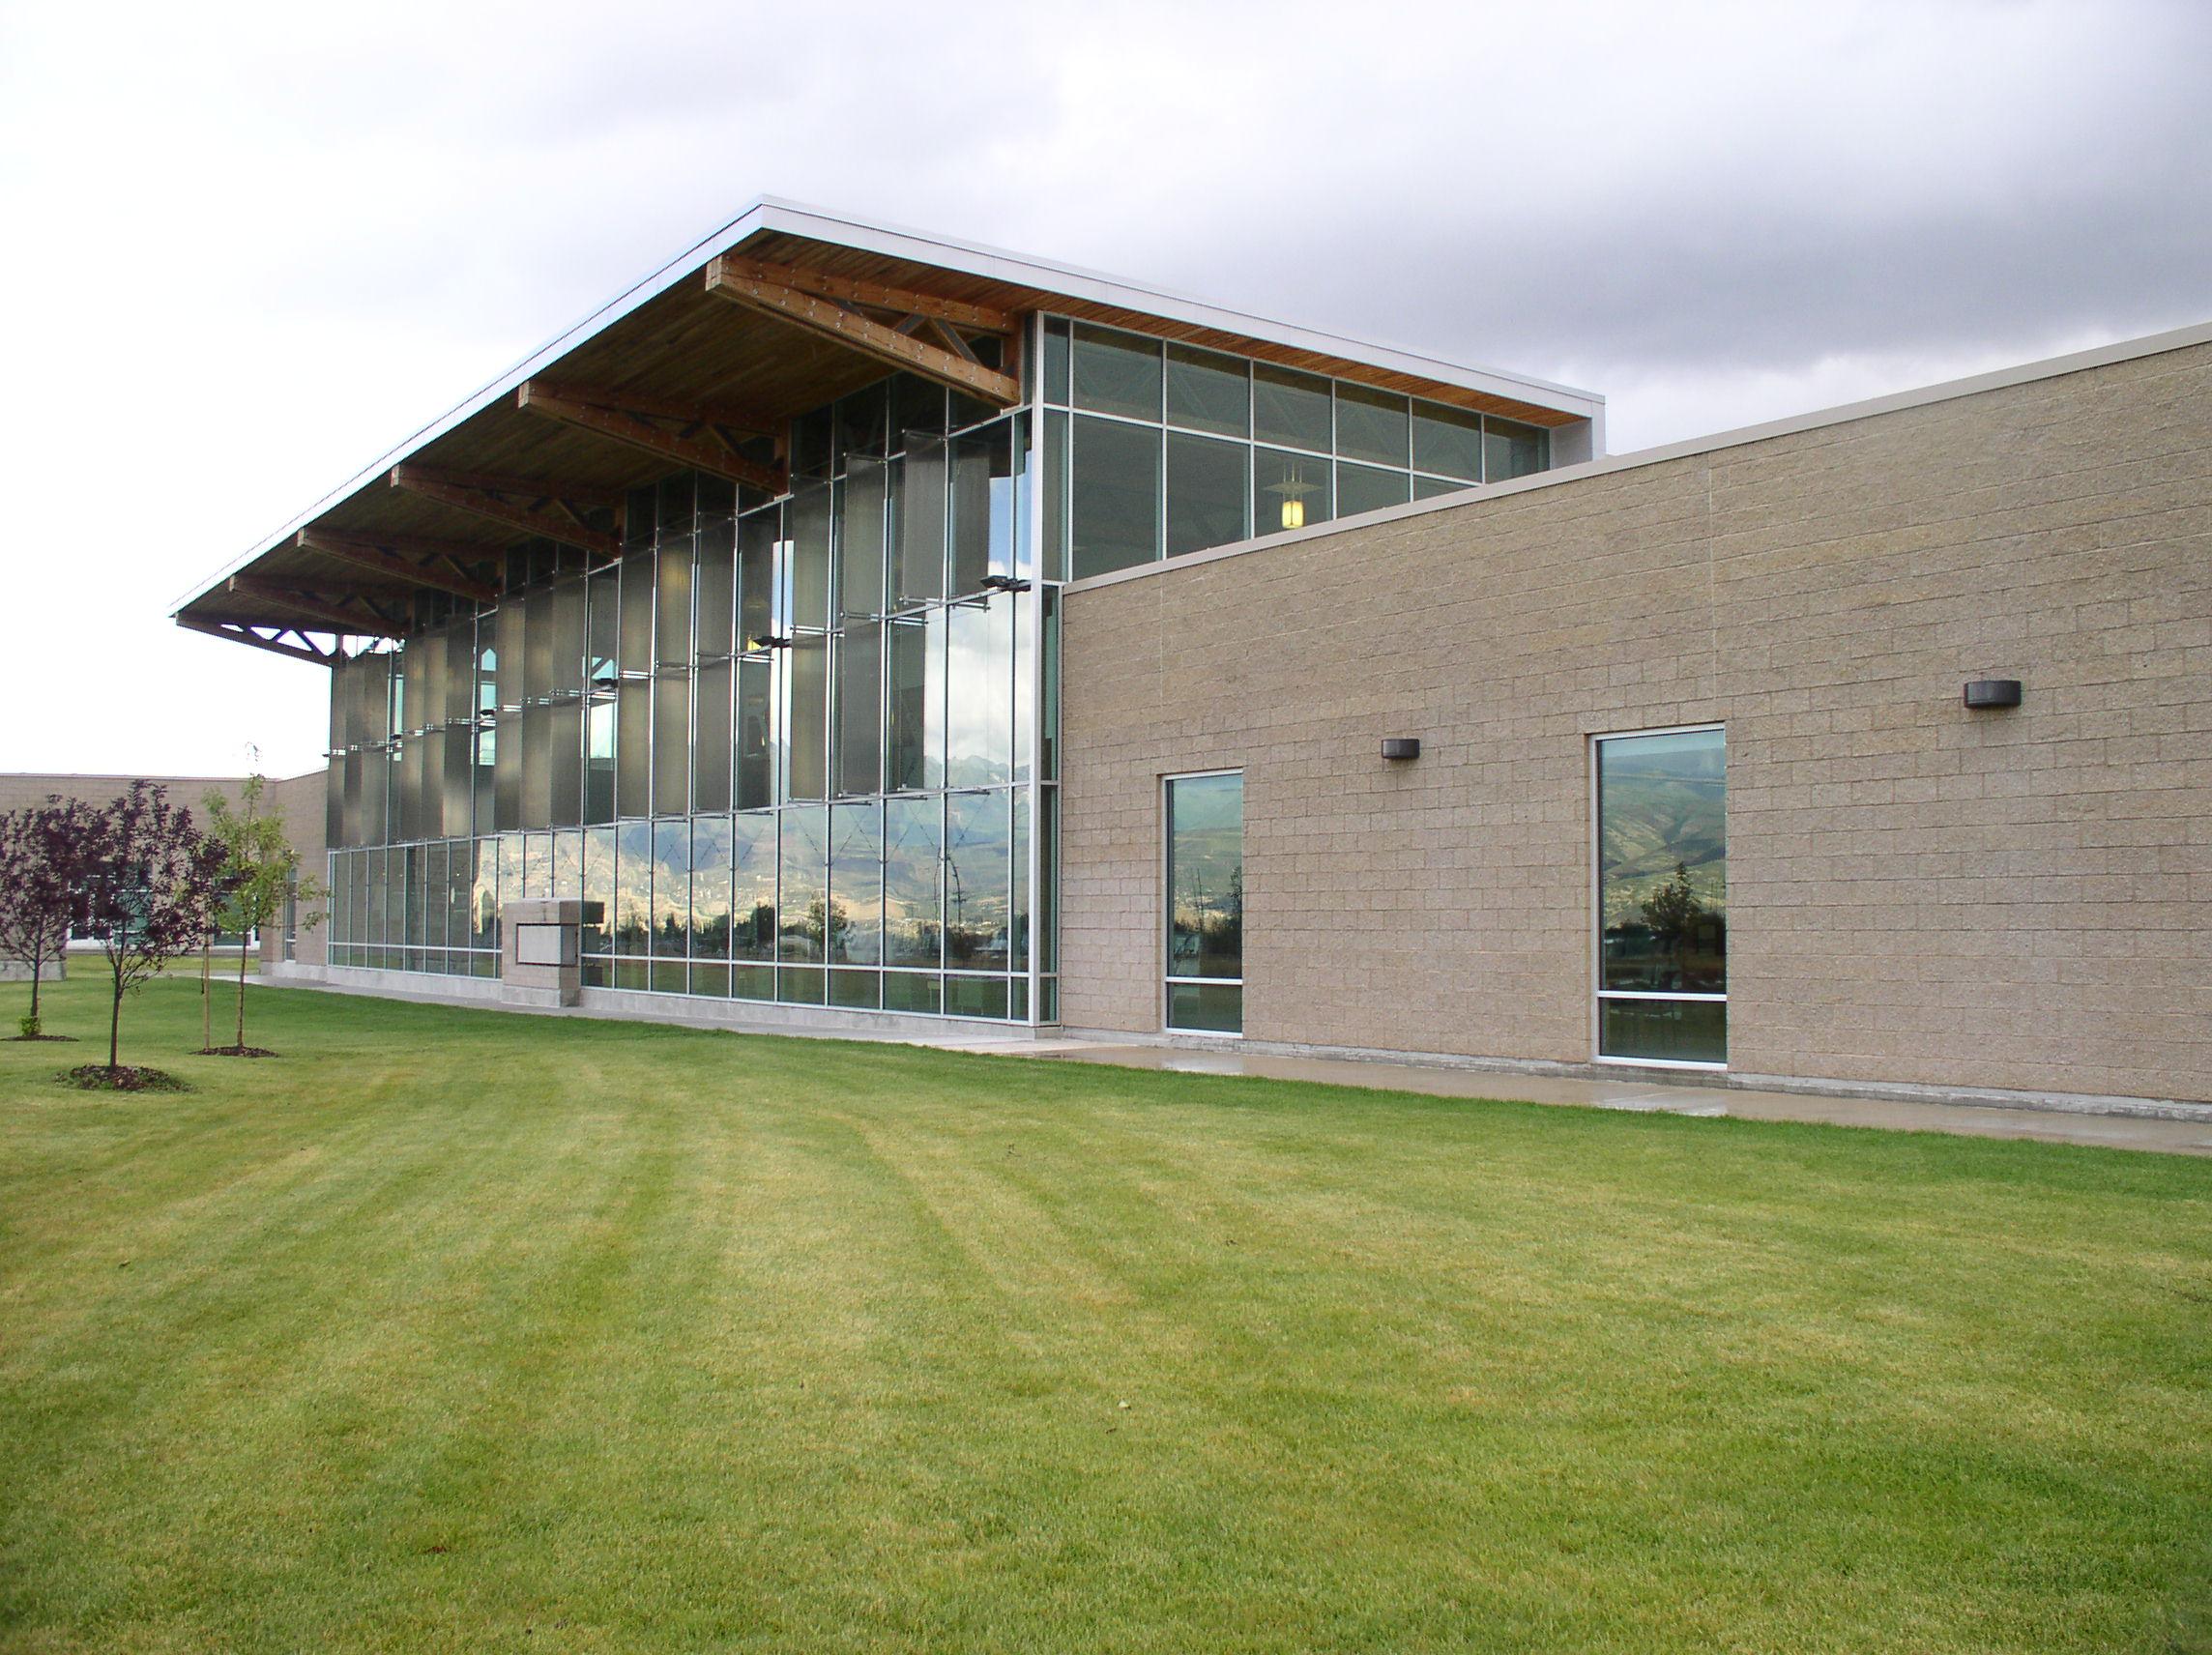 9-12 Library 16.JPG